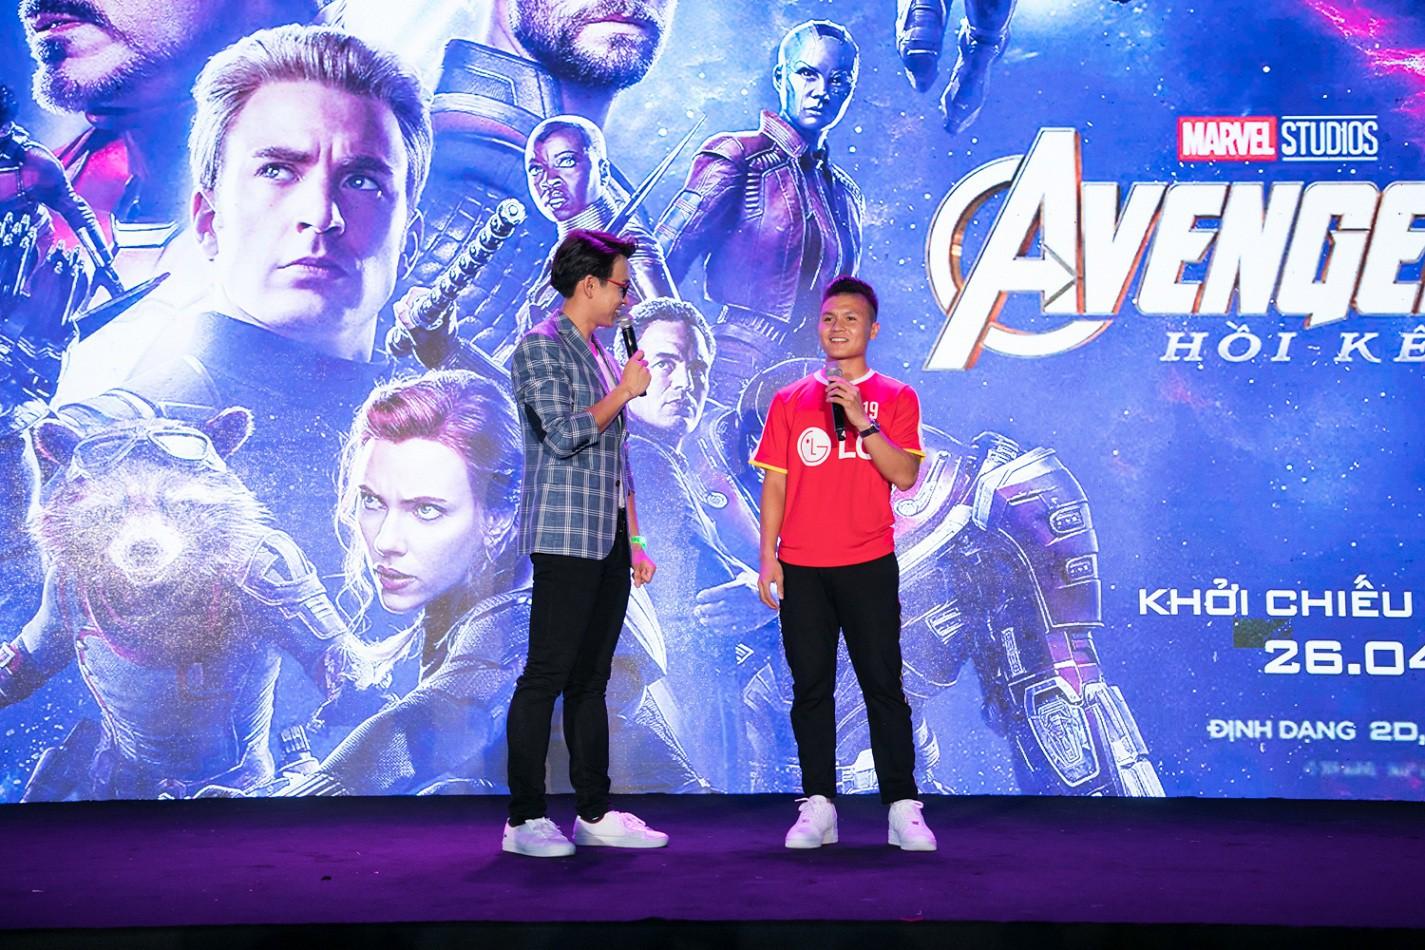 Bắt gặp Quang Hải xuất hiện tại buổi ra mắt Avengers: Endgame - Ảnh 1.